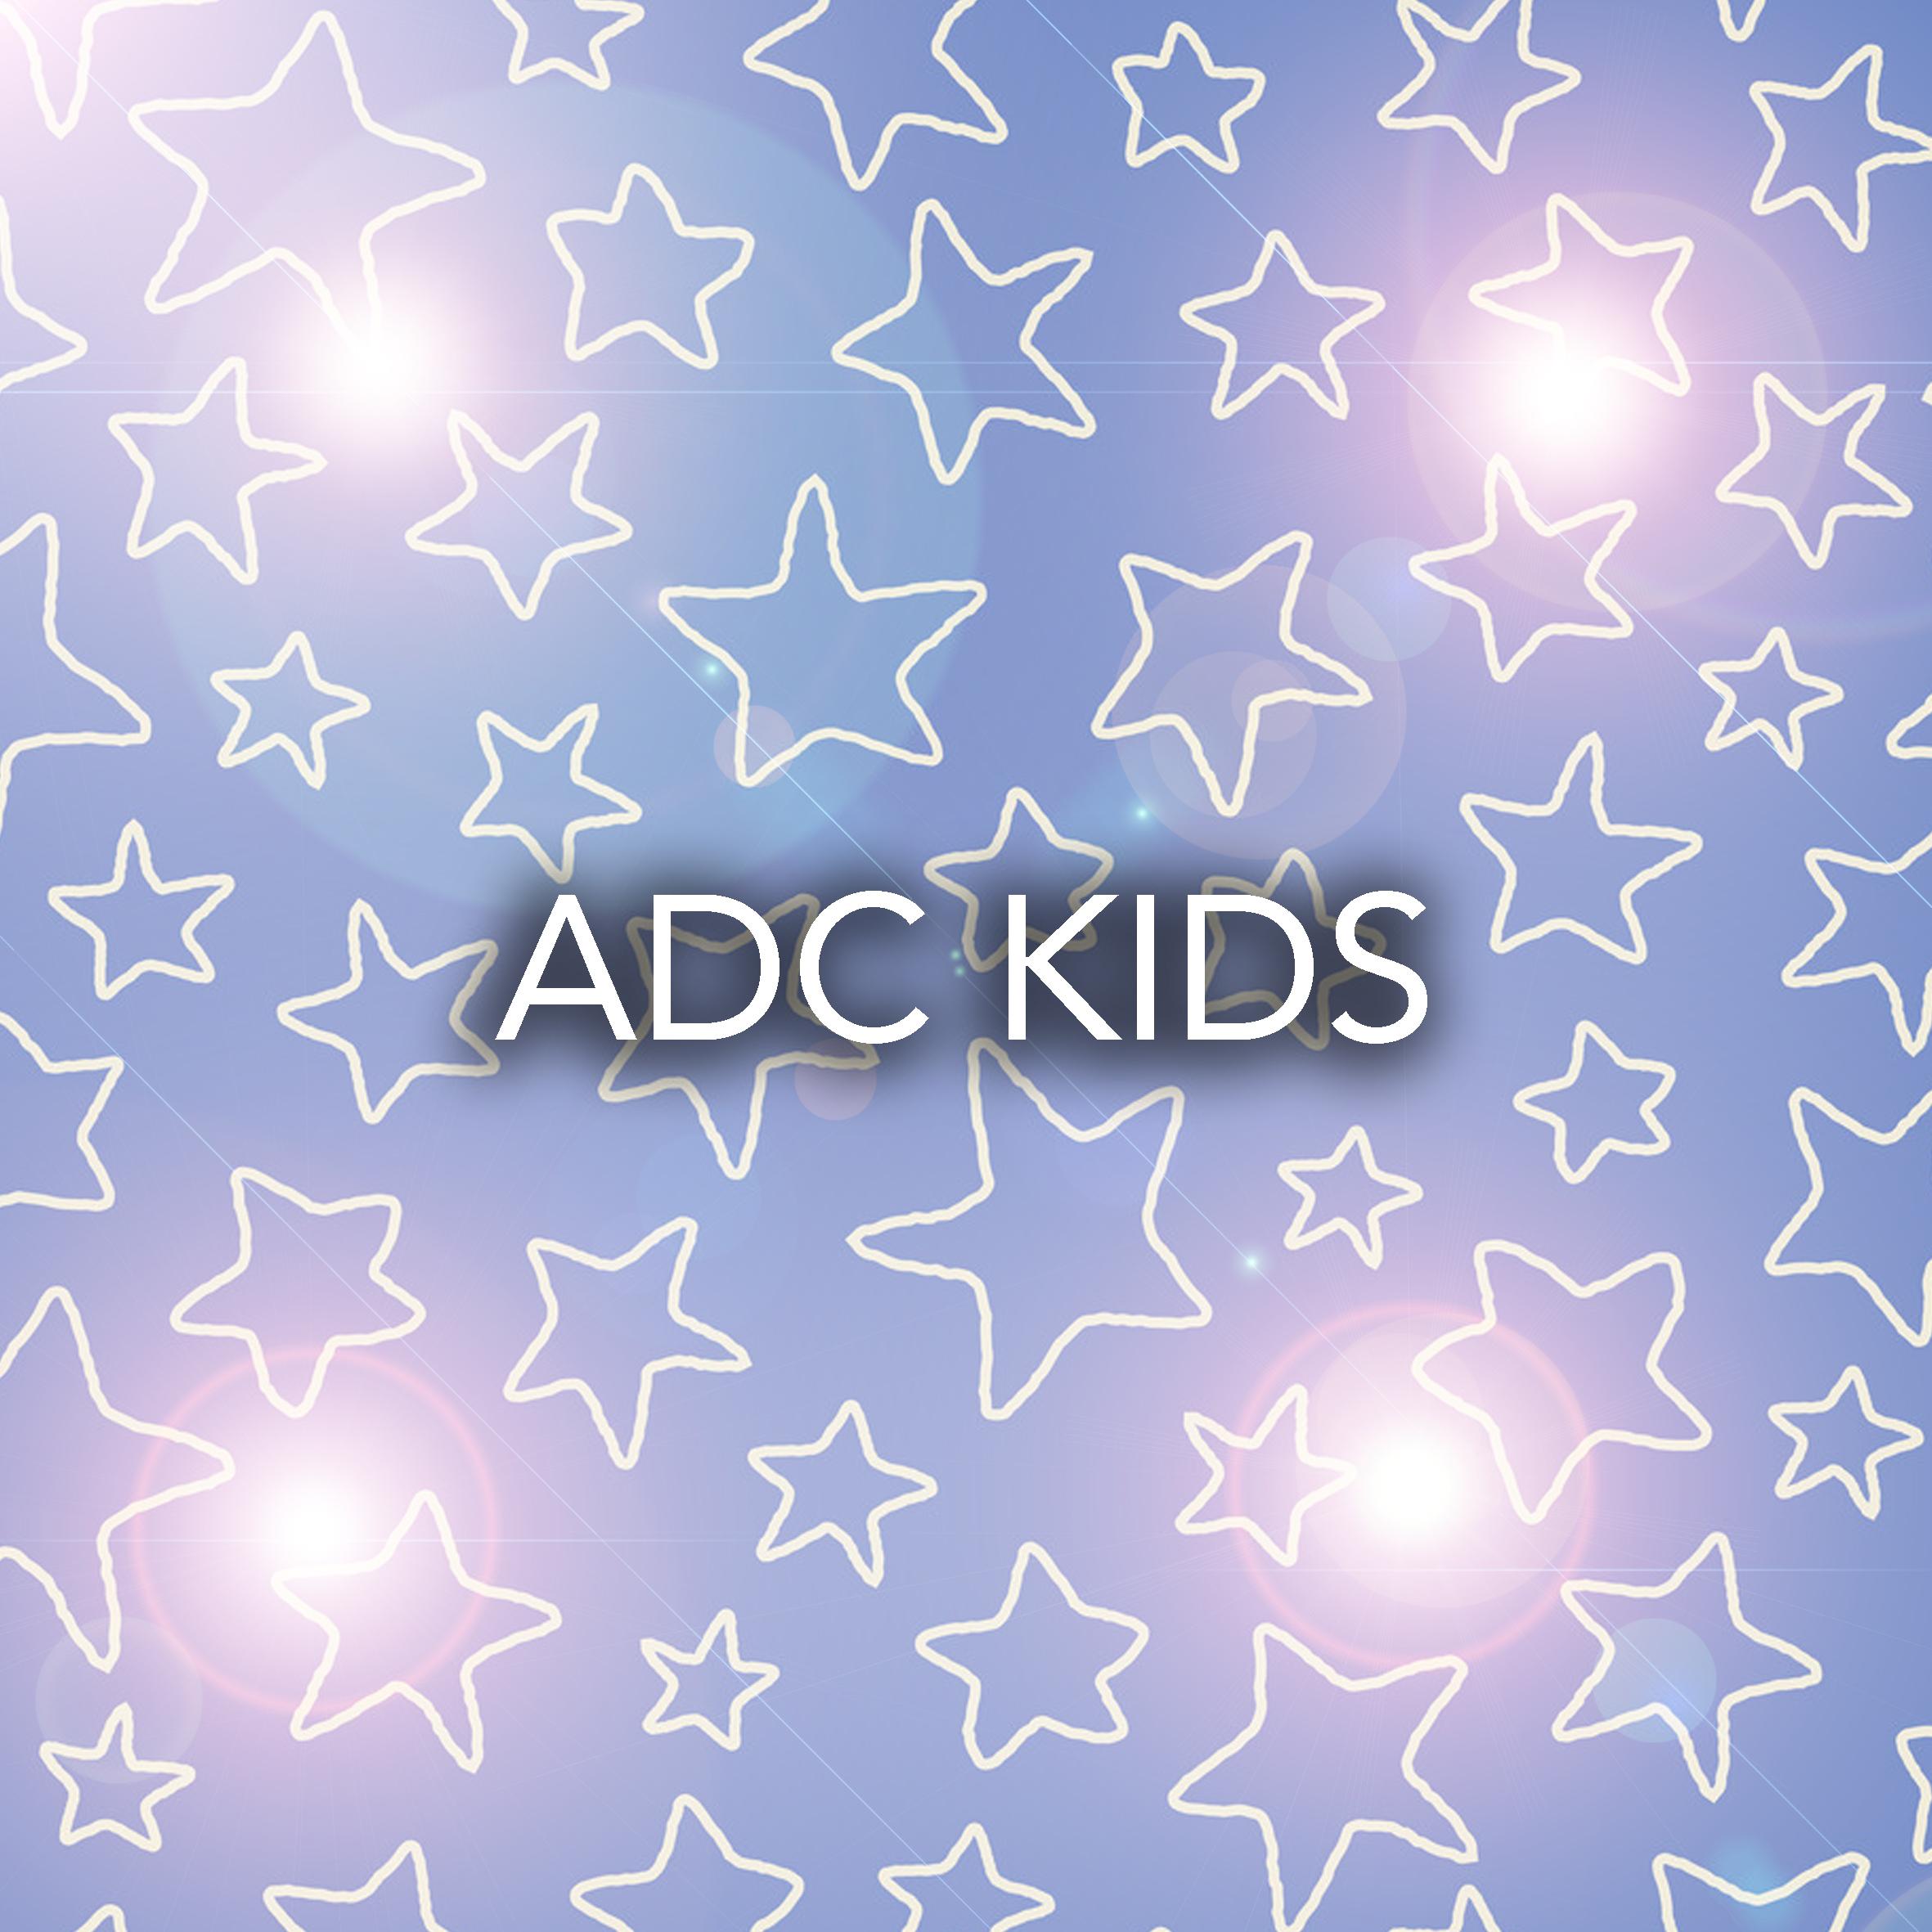 ADC KIDS dance classes auckalndd dance c